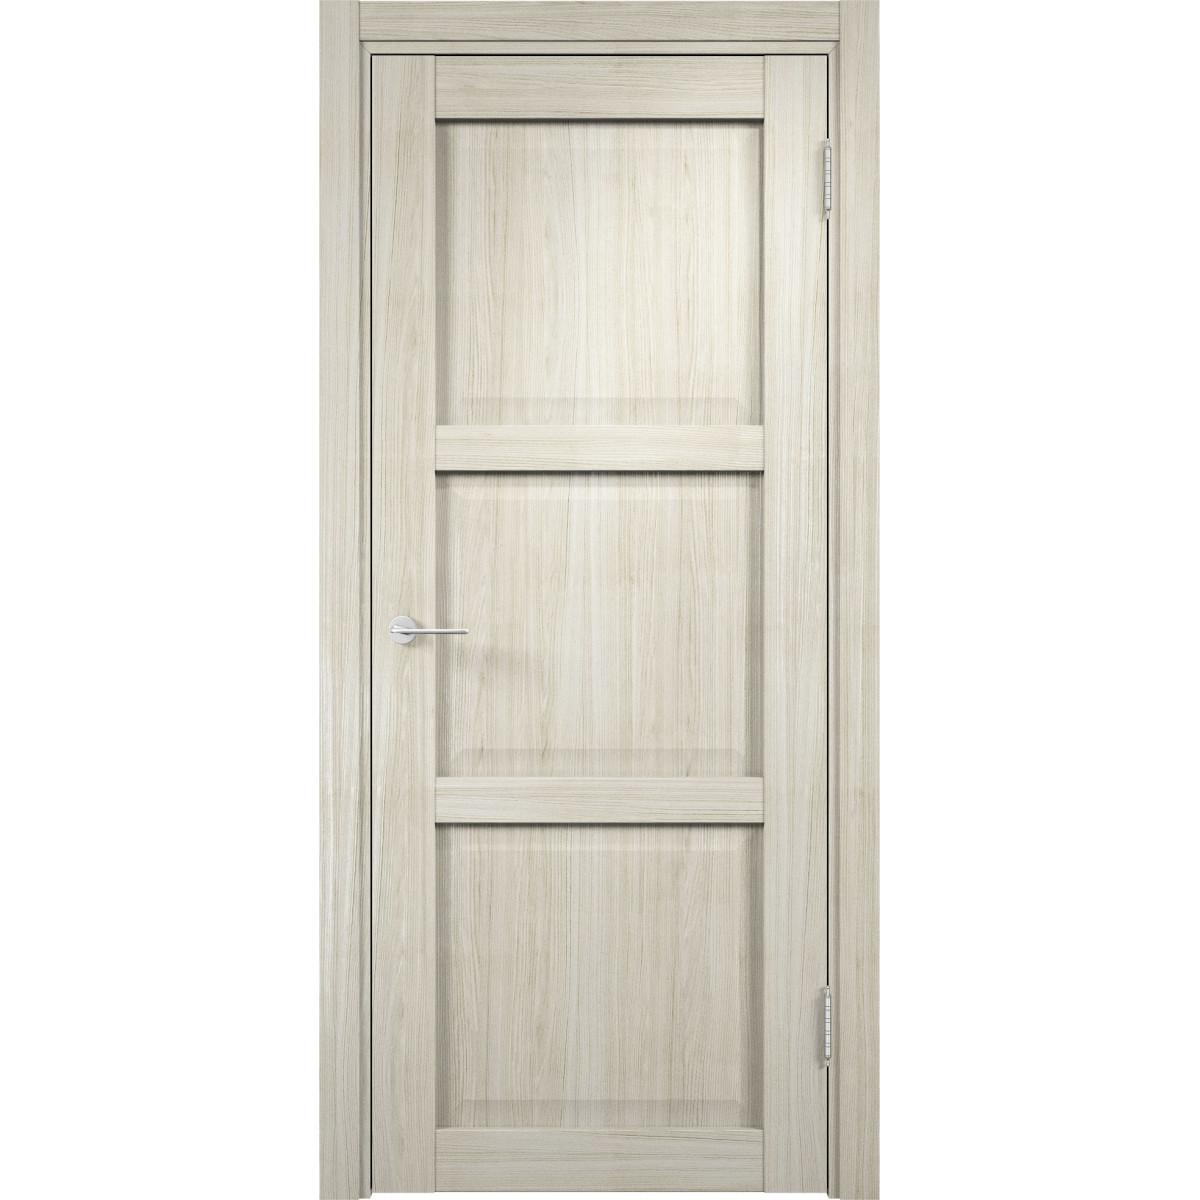 Дверное полотно Casaporte Рома МП_0094 2000х900х44 мм МДФ